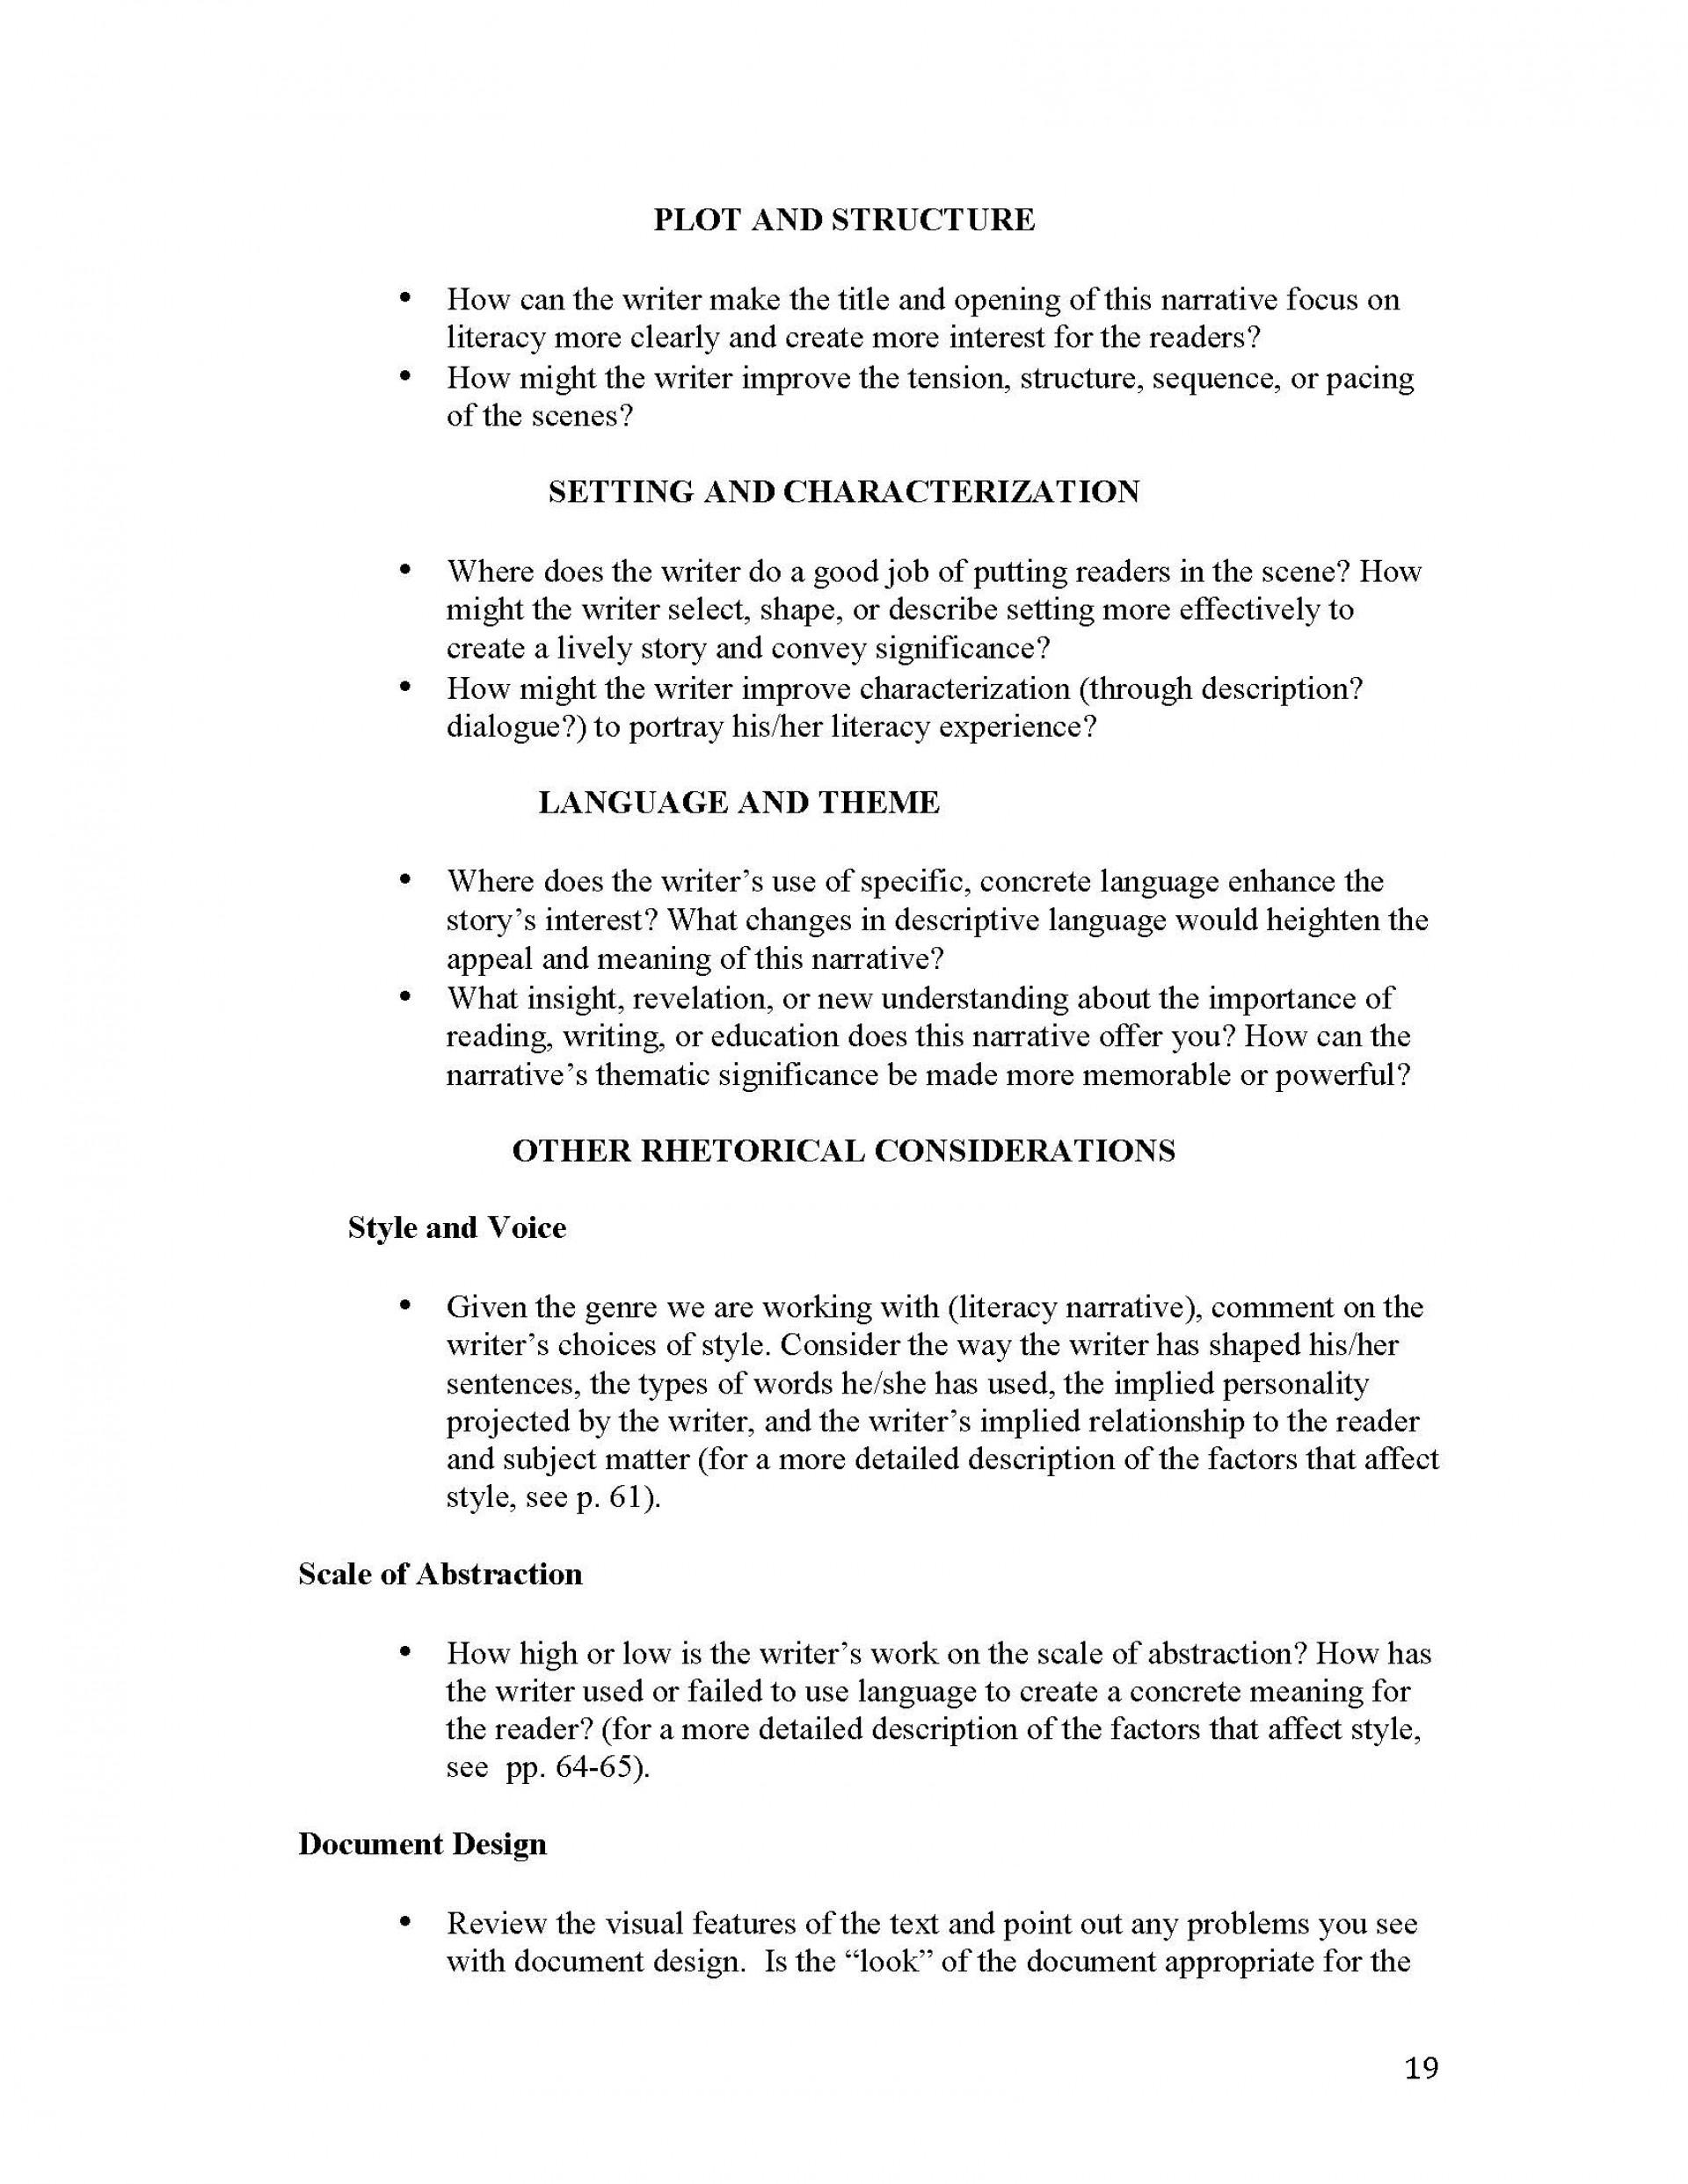 006 Unit 1 Literacy Narrative Instructor Copy Page 19 Argumentative Essay Definition Fearsome Define Persuasive/argumentative Pdf 1920